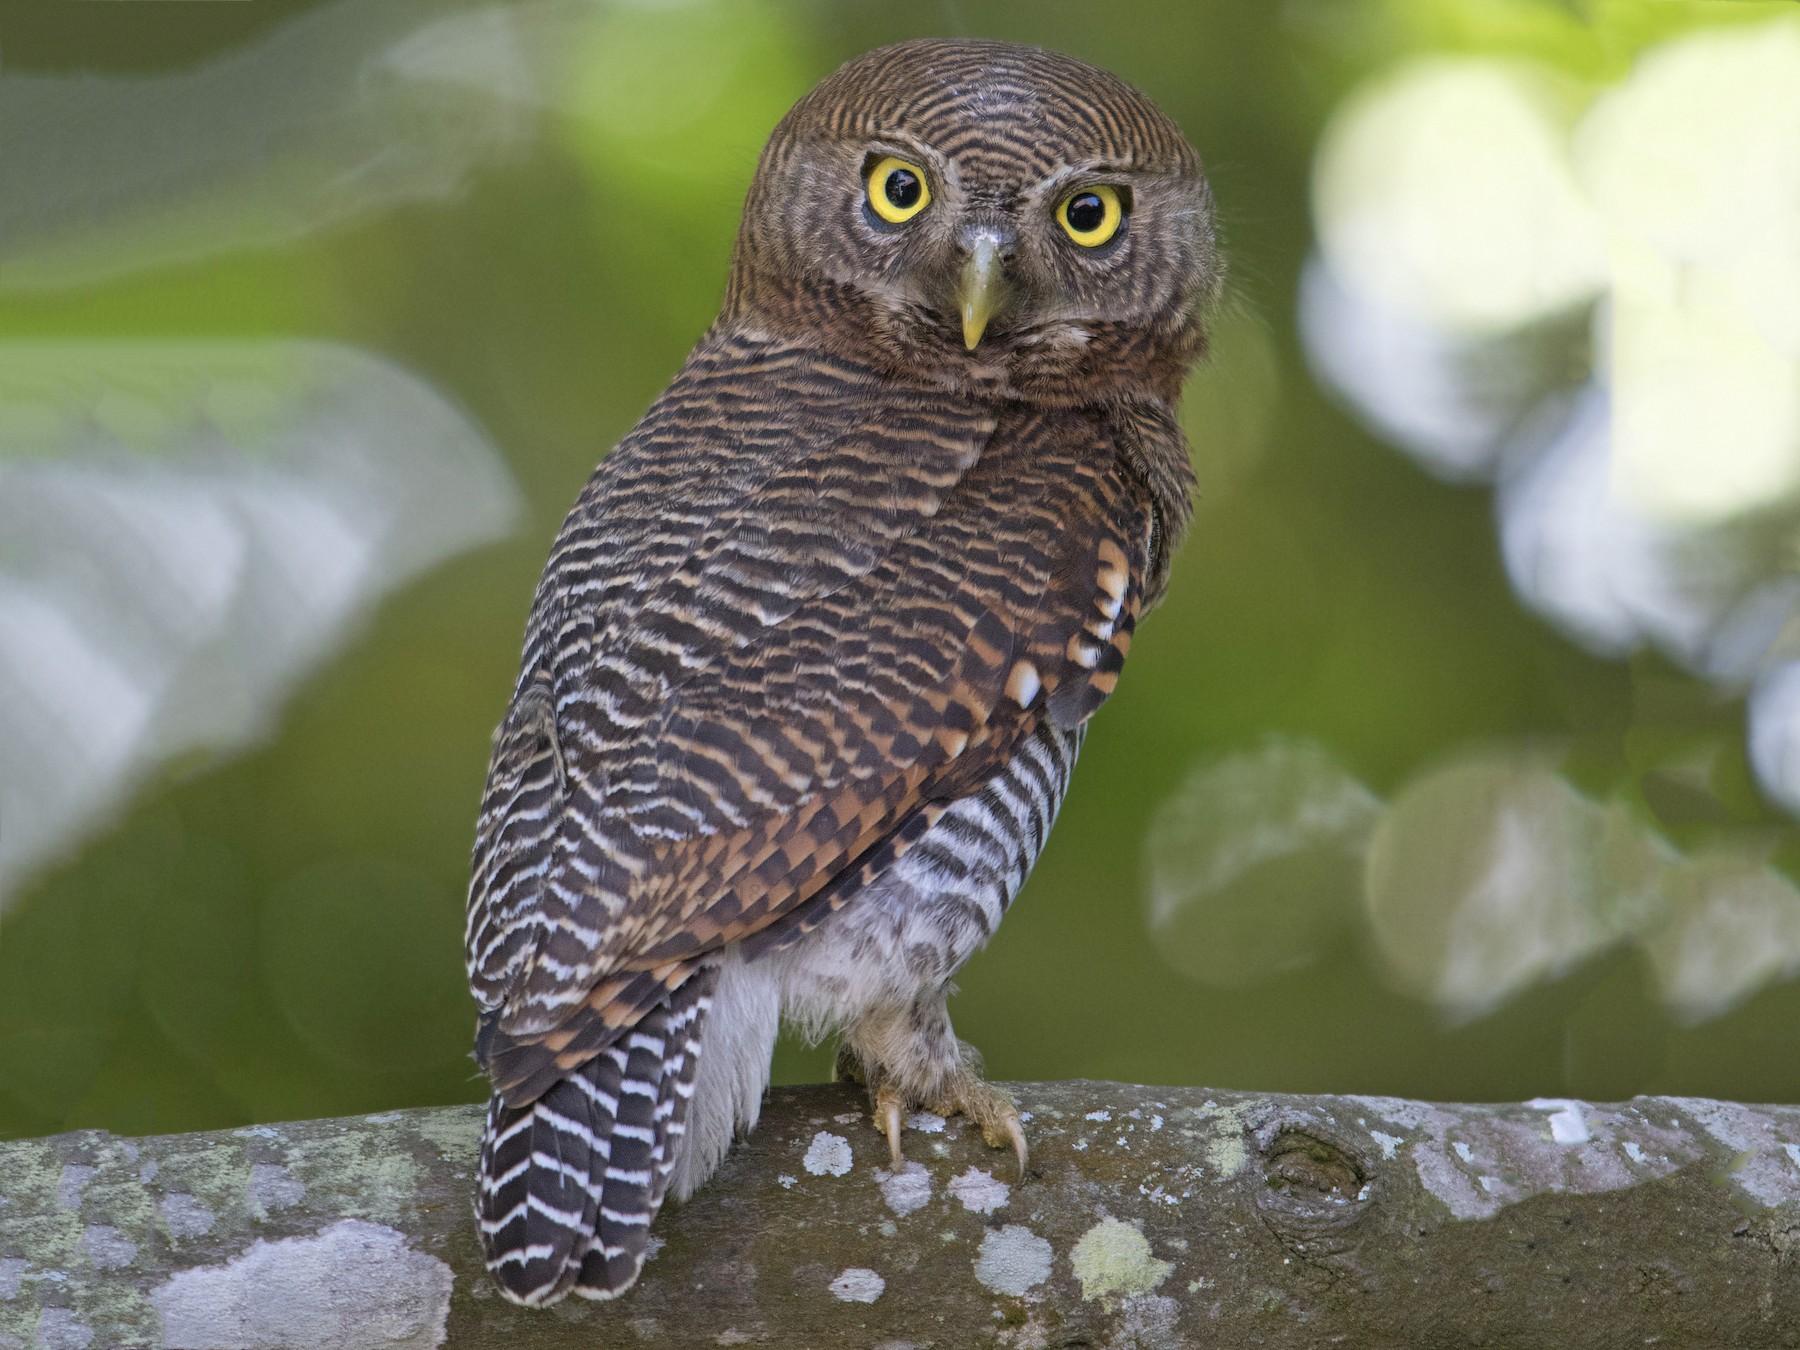 Jungle Owlet - Swapnil Thatte